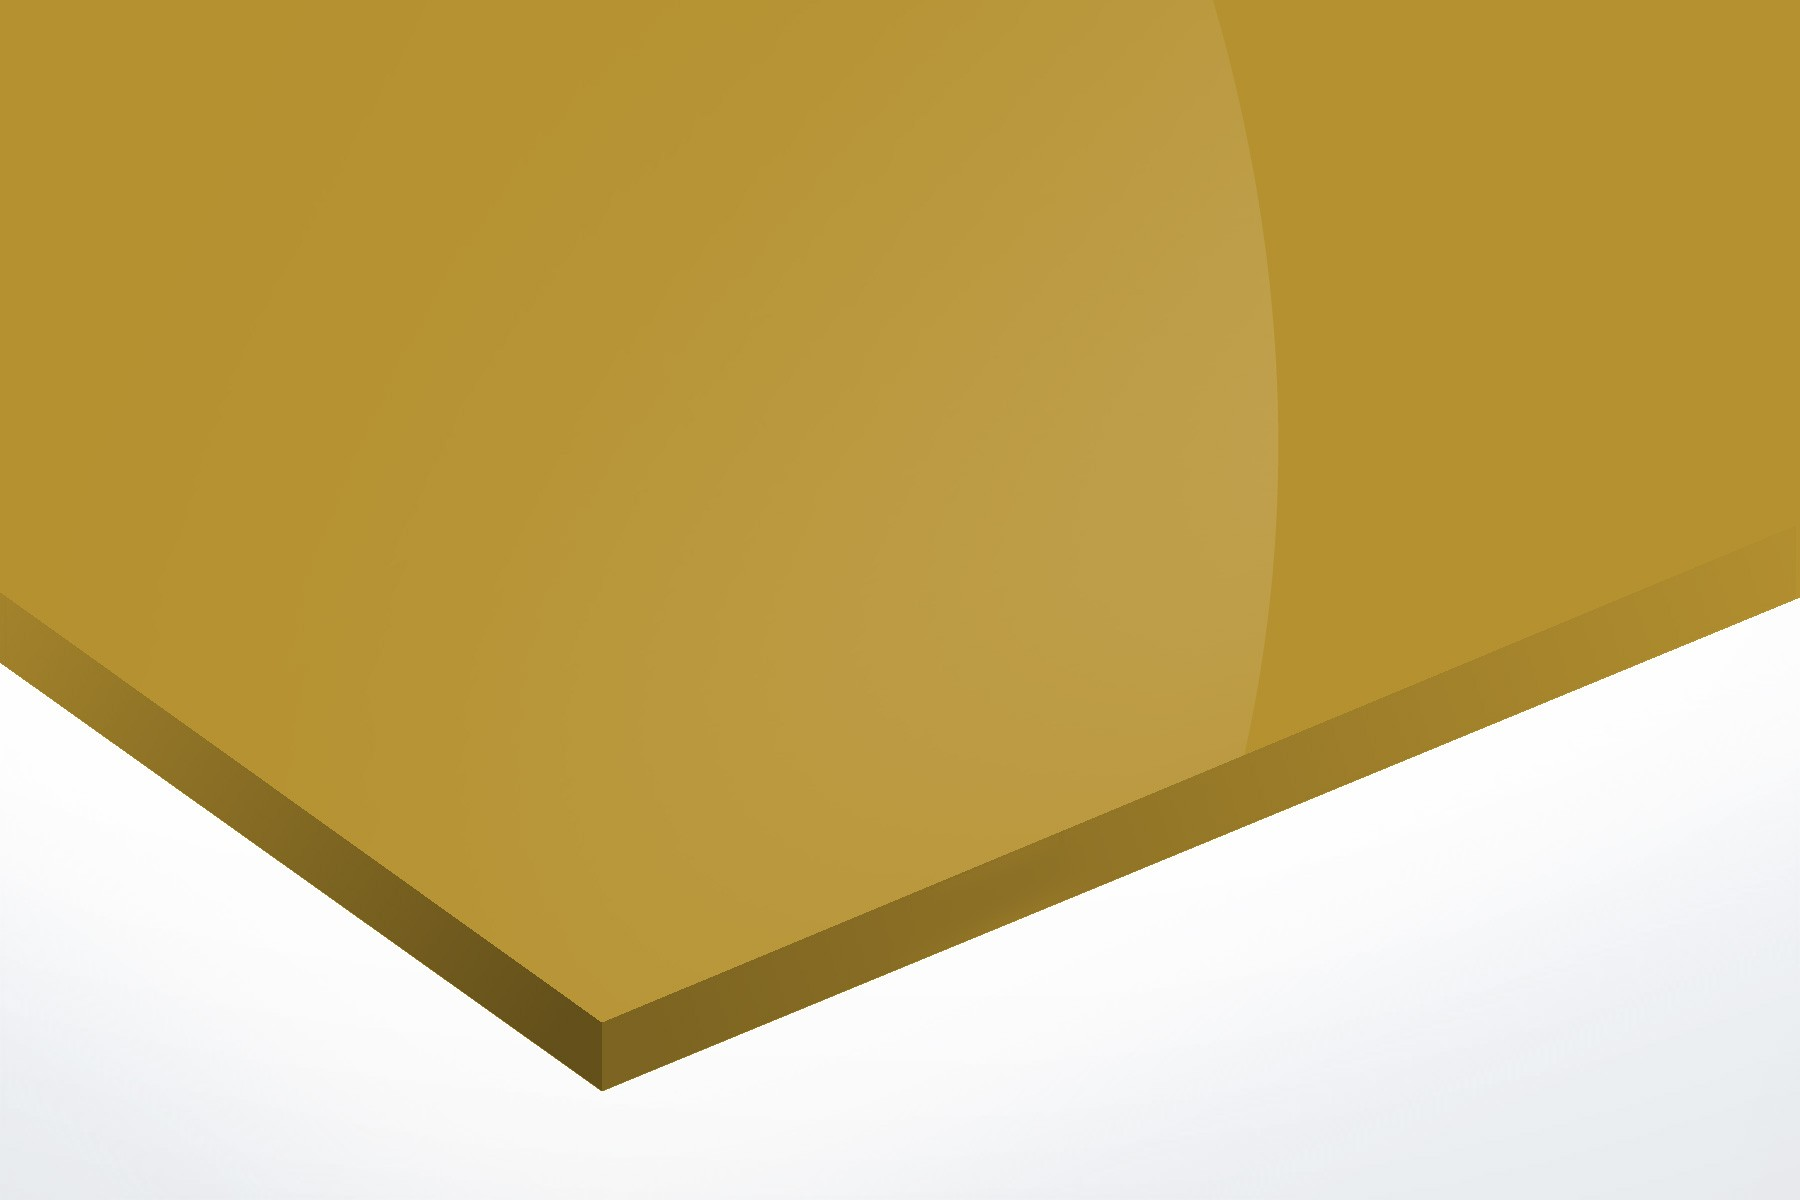 Anodised Aluminium Gold, Gloss 1mm x 1000mm x 500mm